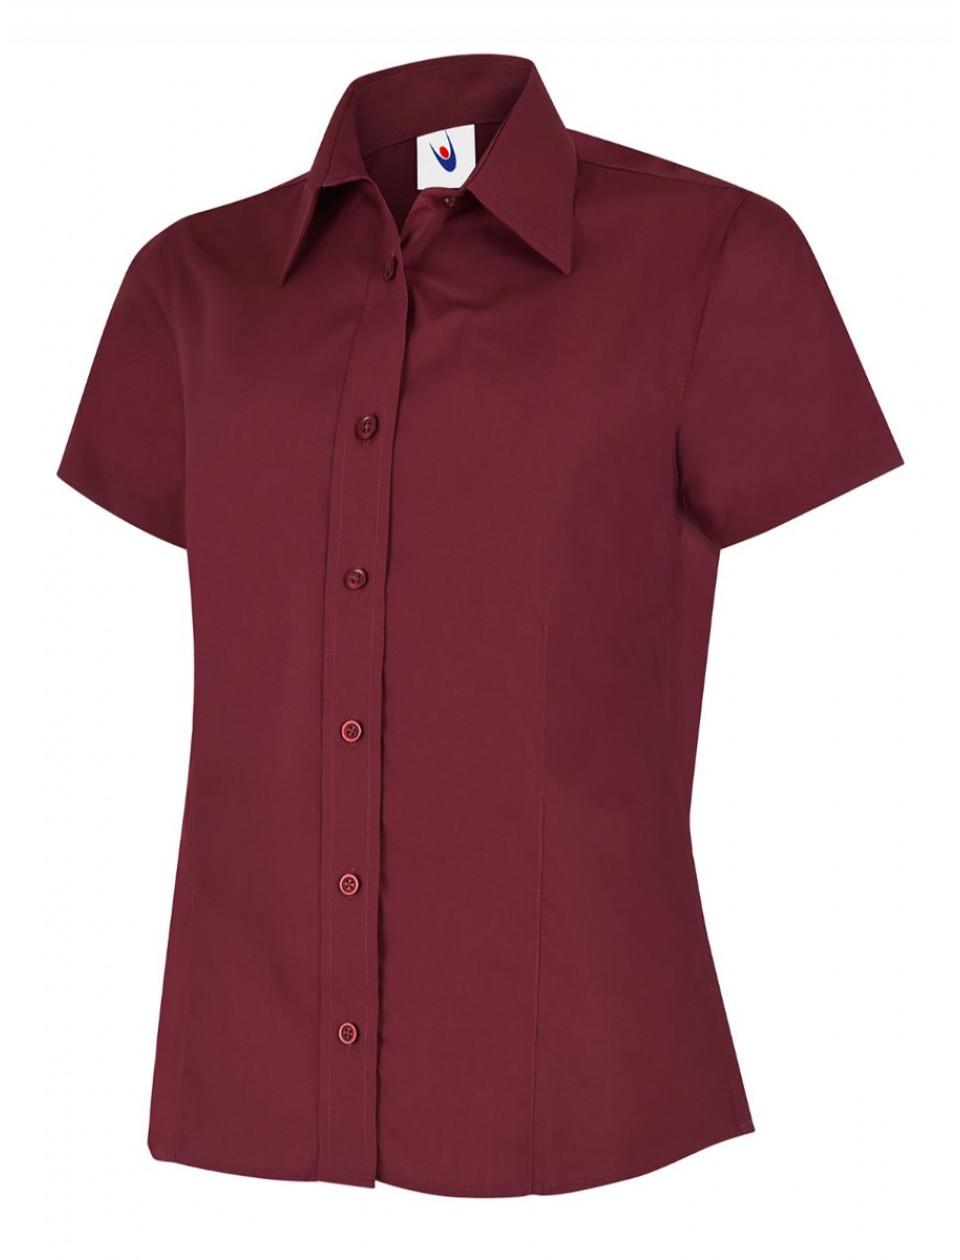 Uneek UC712 Ladies Poplin Half Sleeve Shirt  Clothing